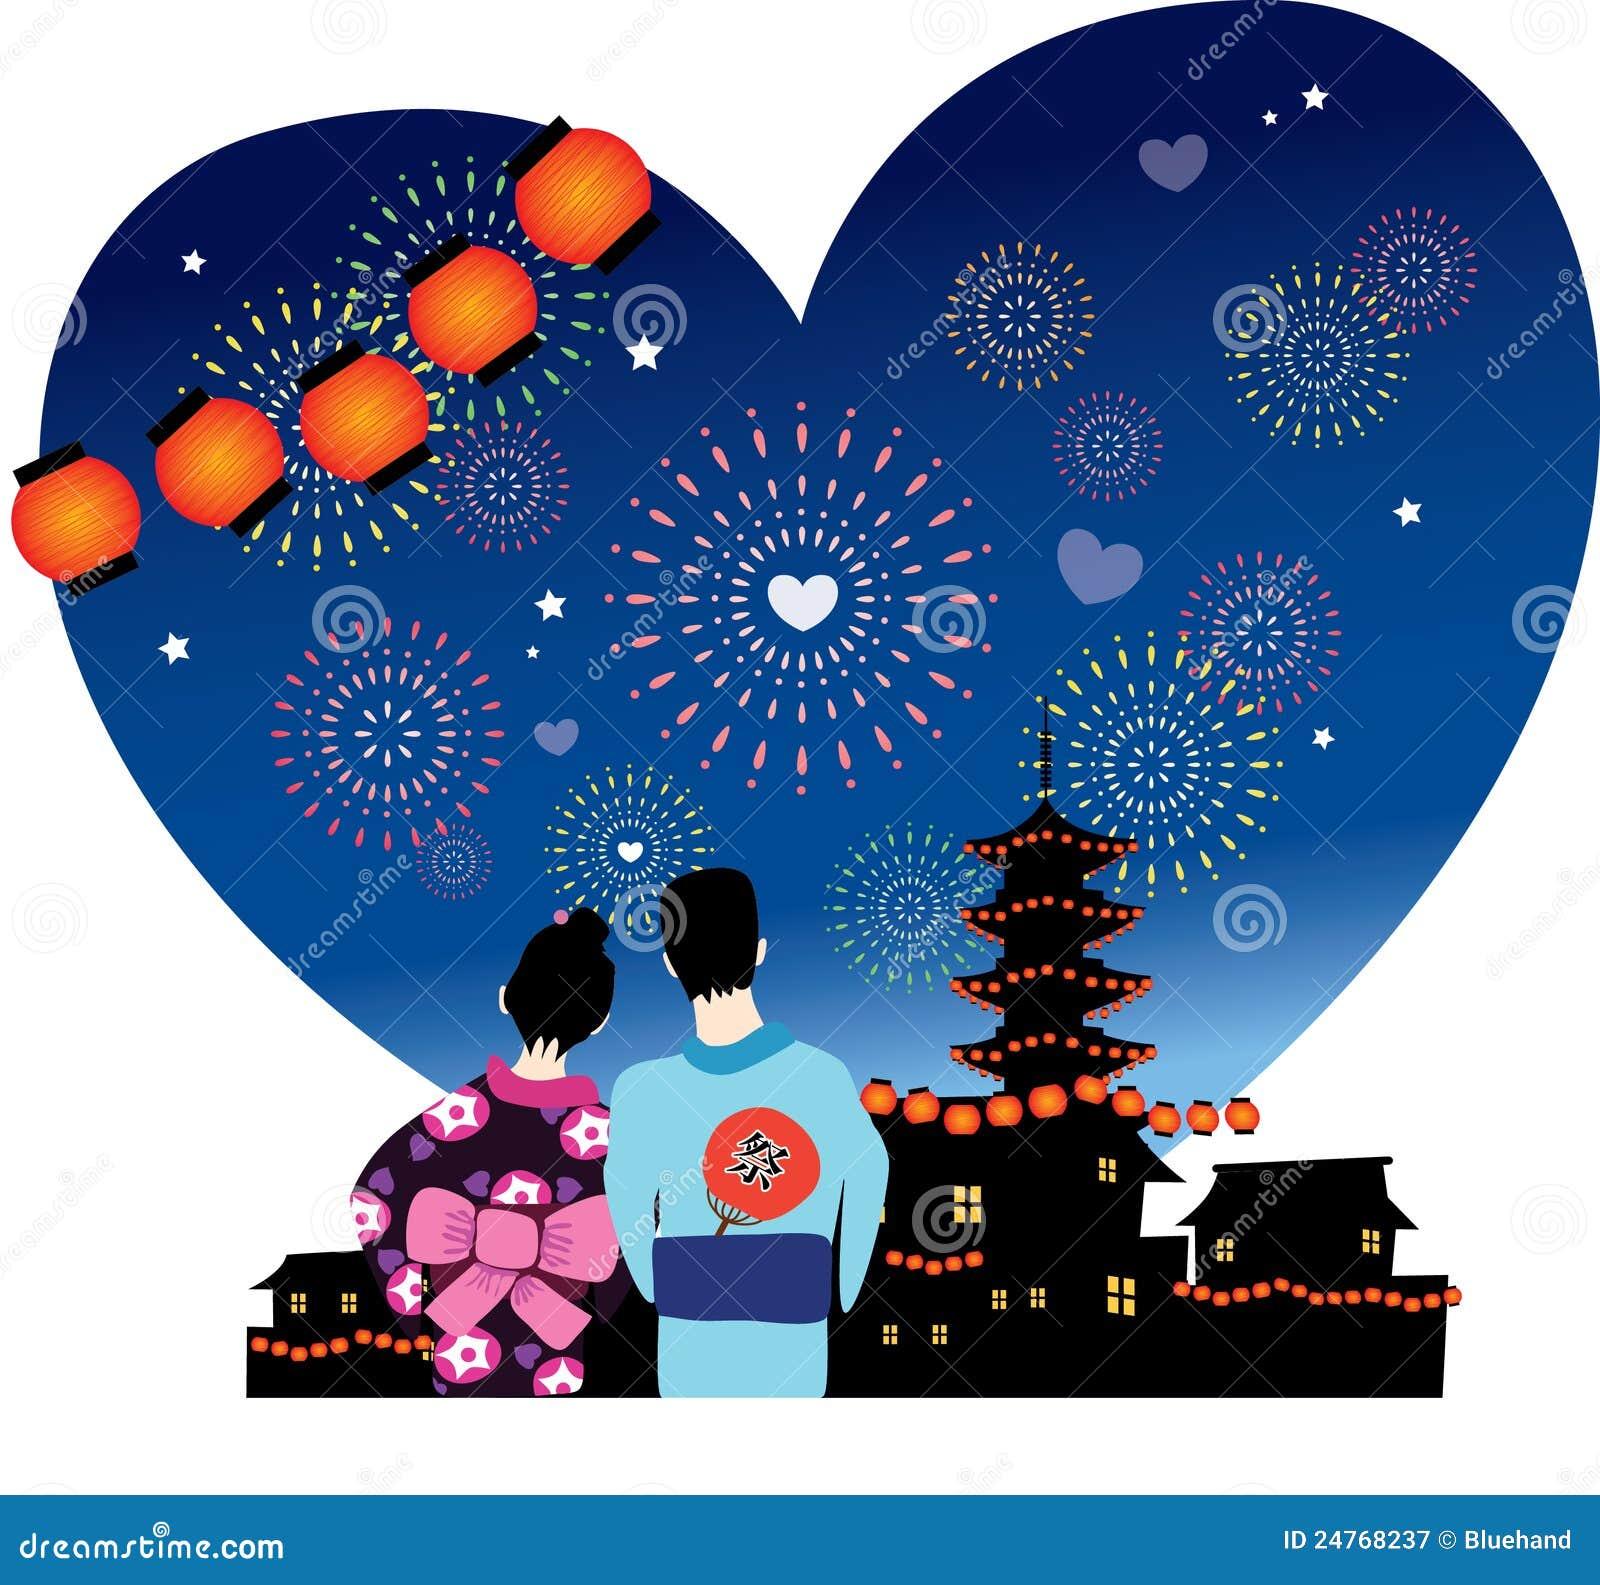 100 free online dating japan